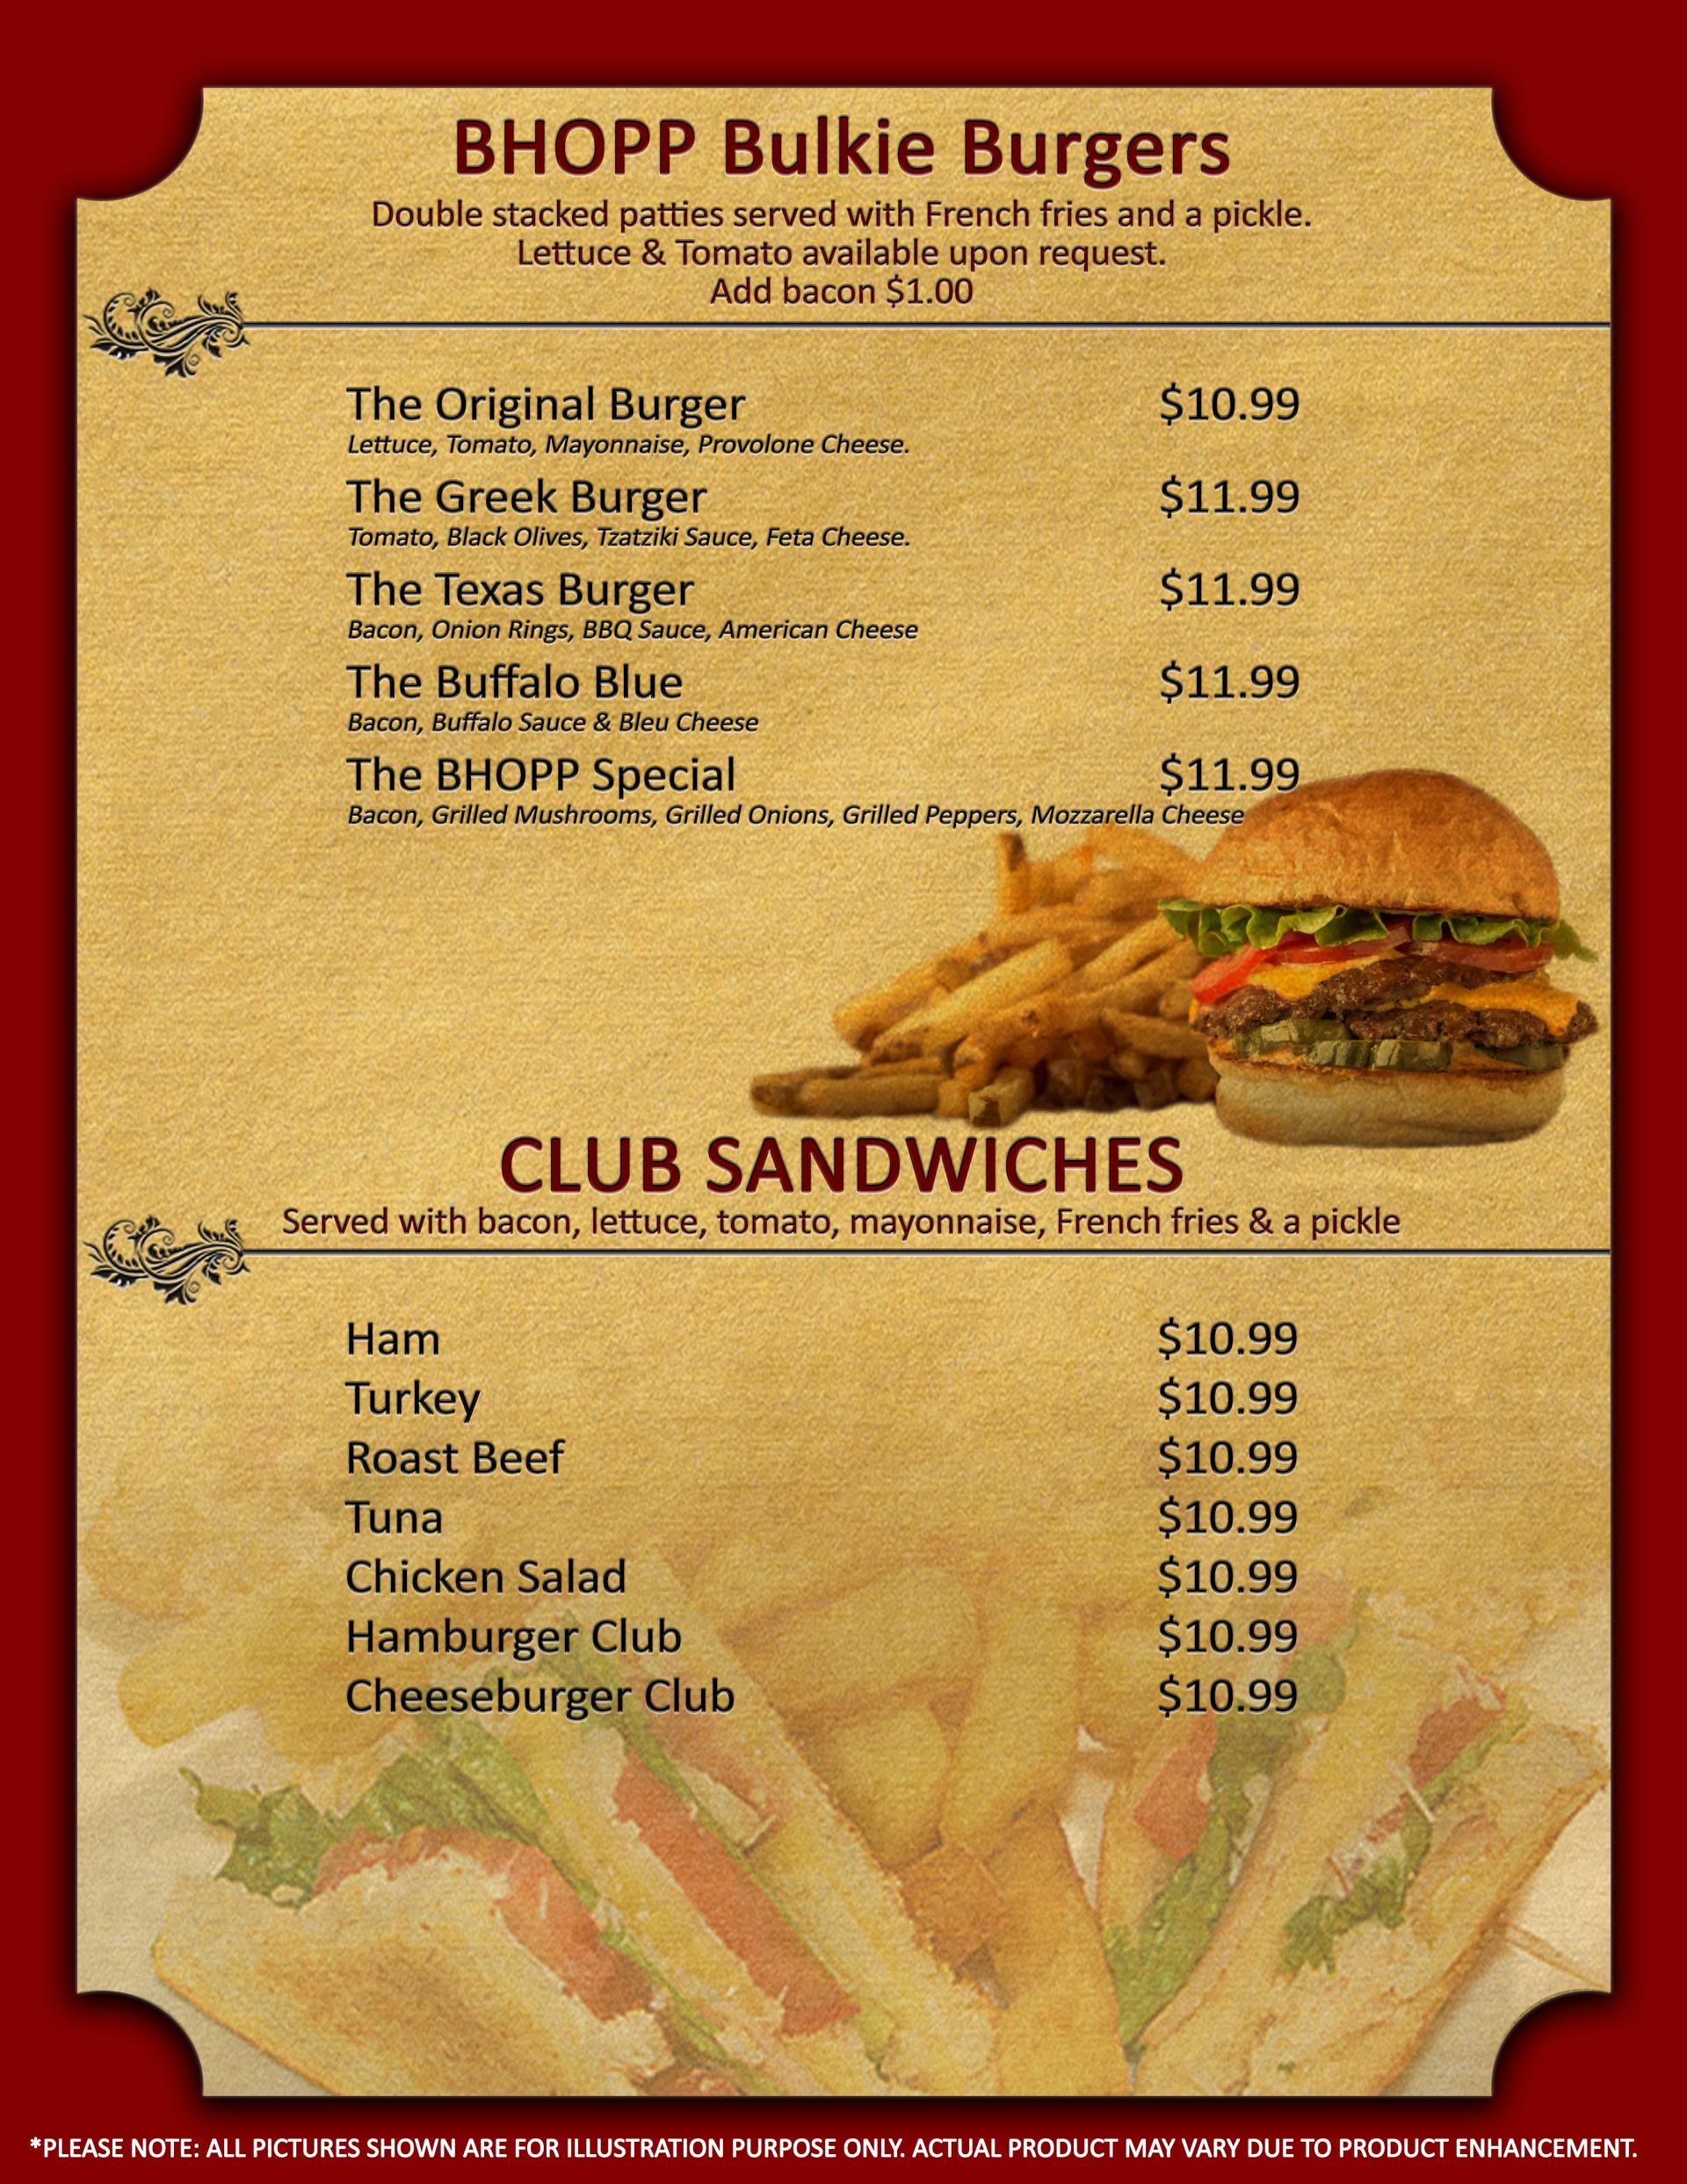 Burges & Cub Sandwiches